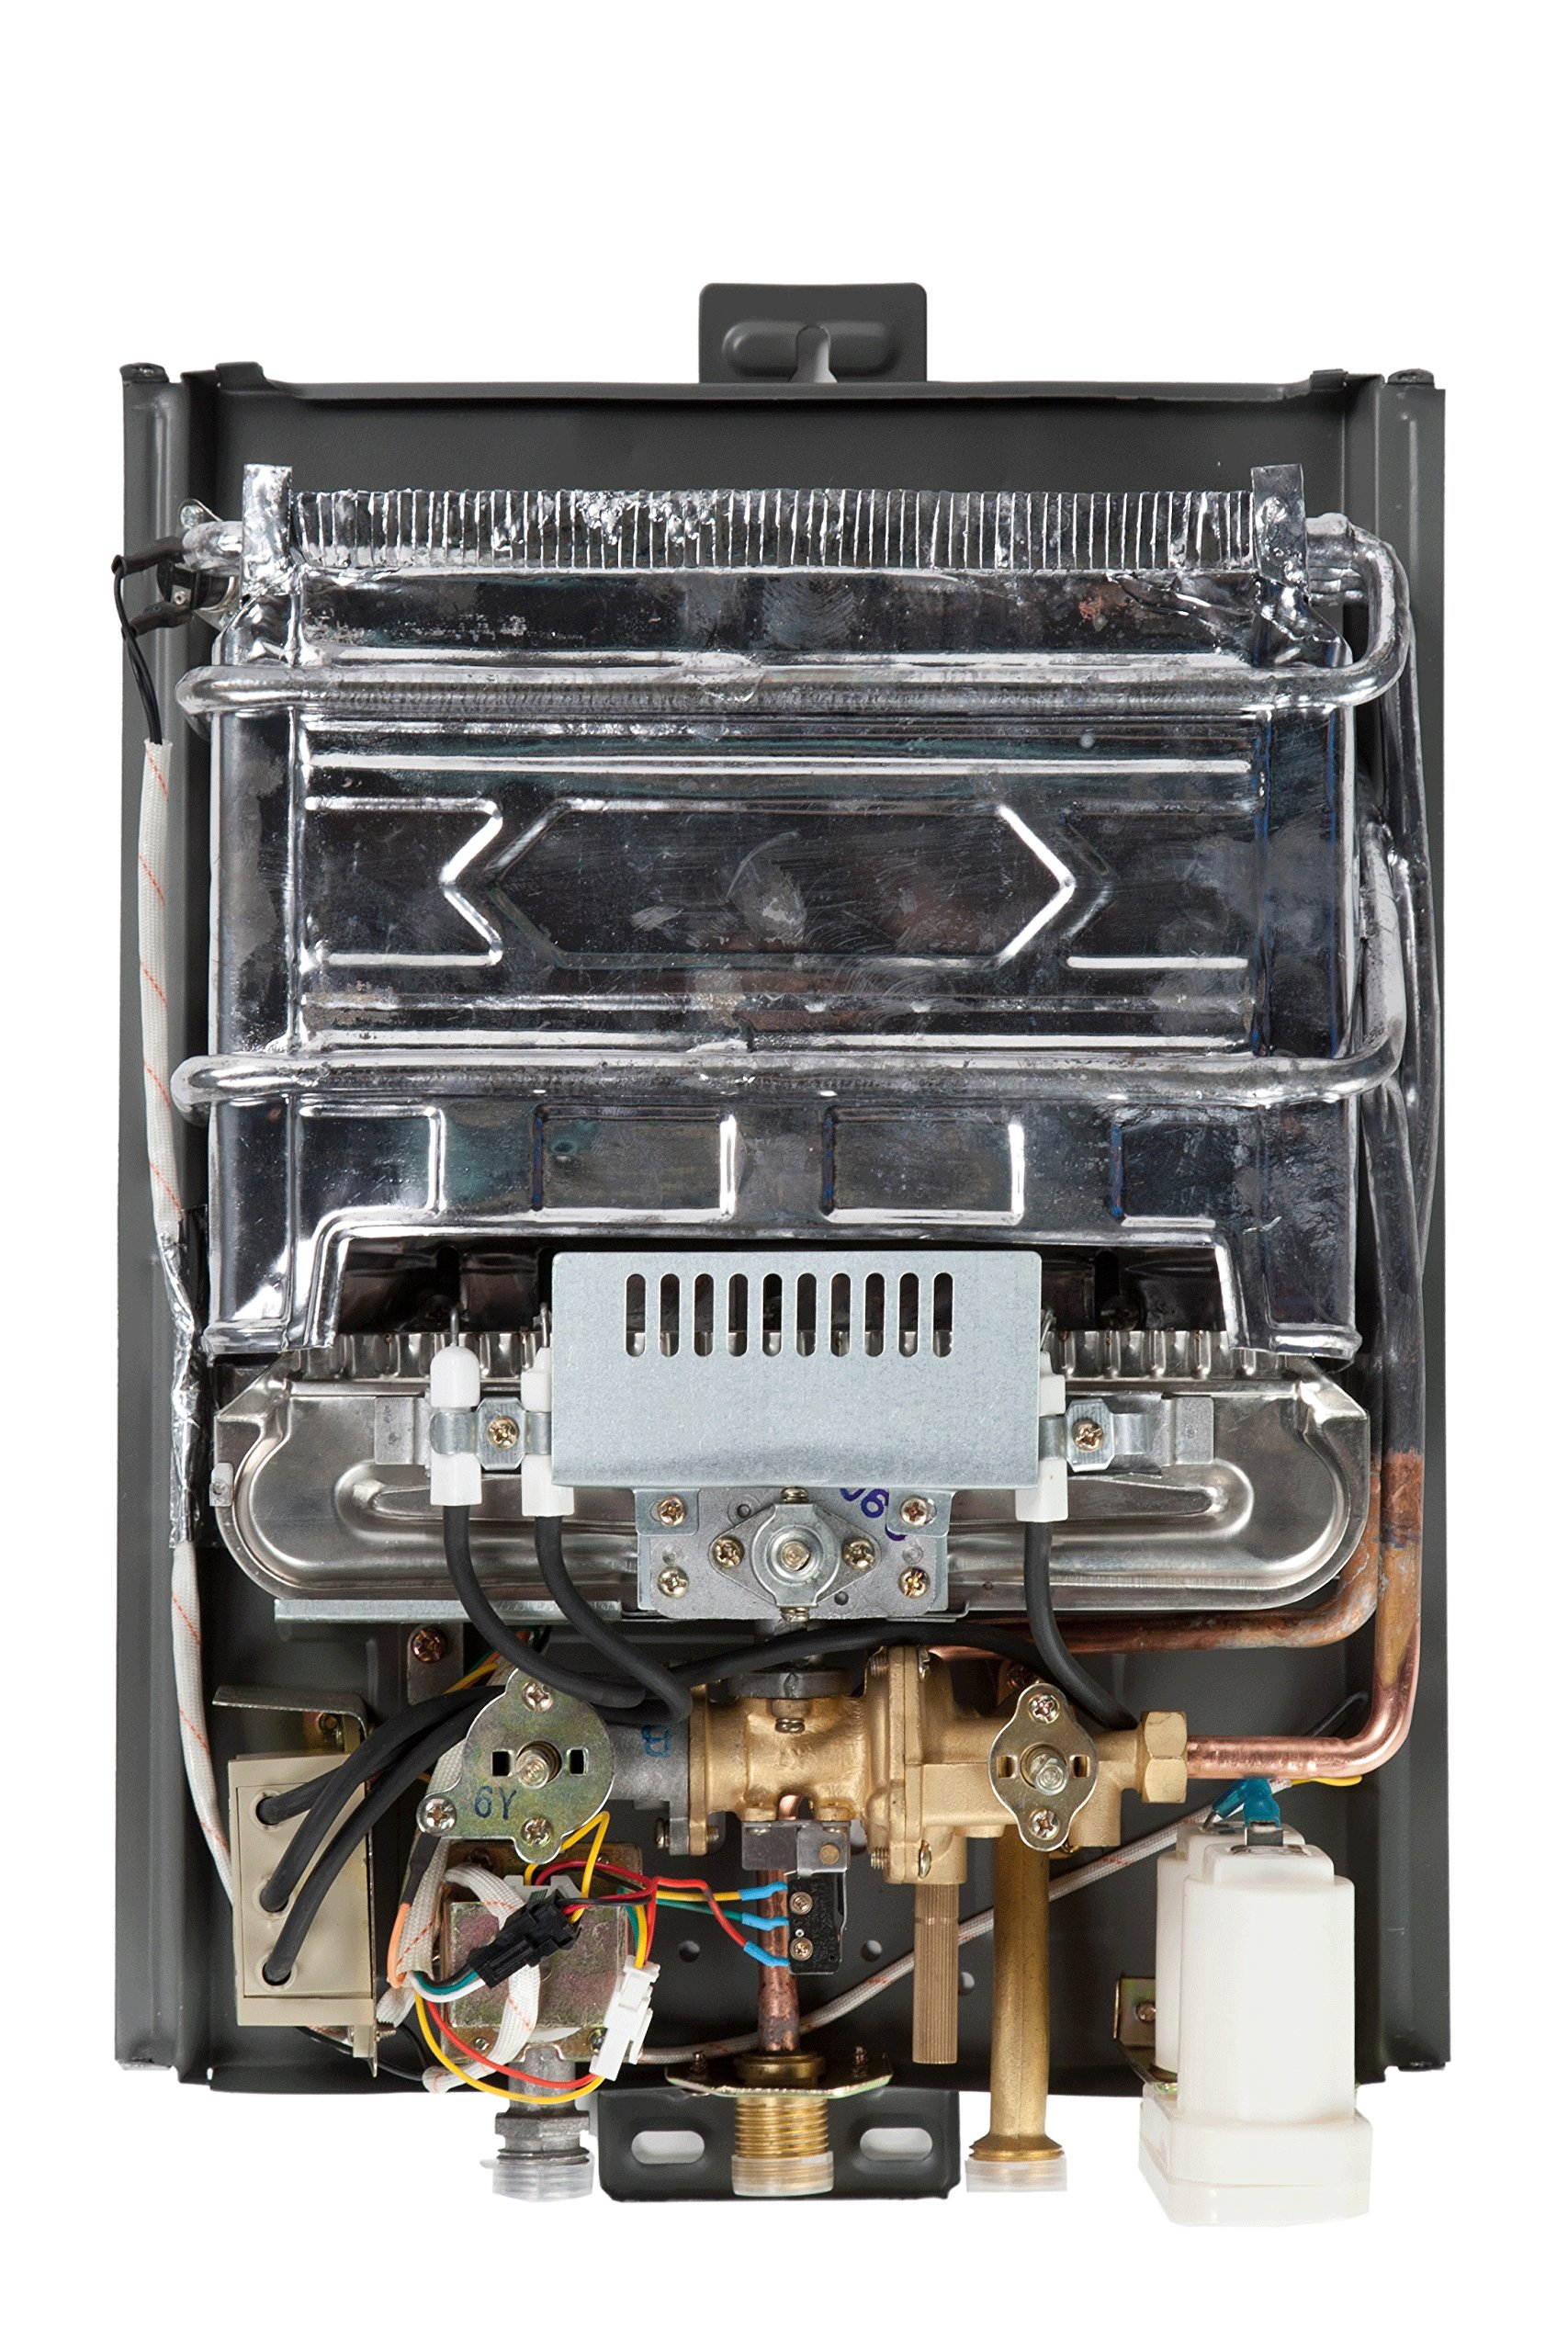 iHeat Tankless AGL-5 34,000/btu-hr 5 Liter LPG Gas Portable Water Heater Kit by iHeat Tankless